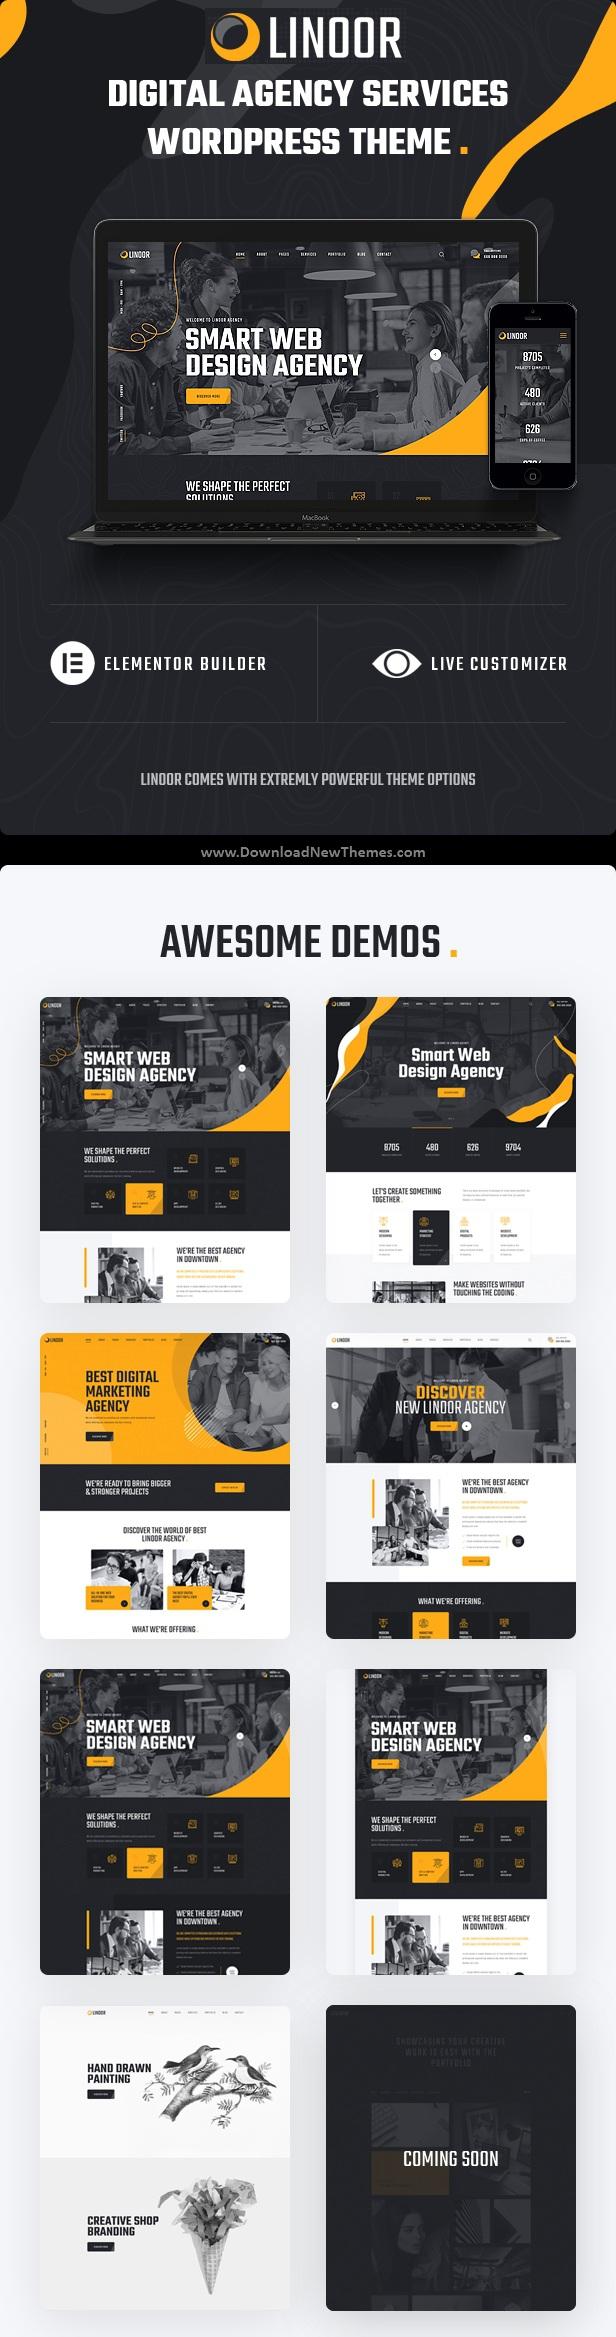 Digital Agency Services WordPress Theme